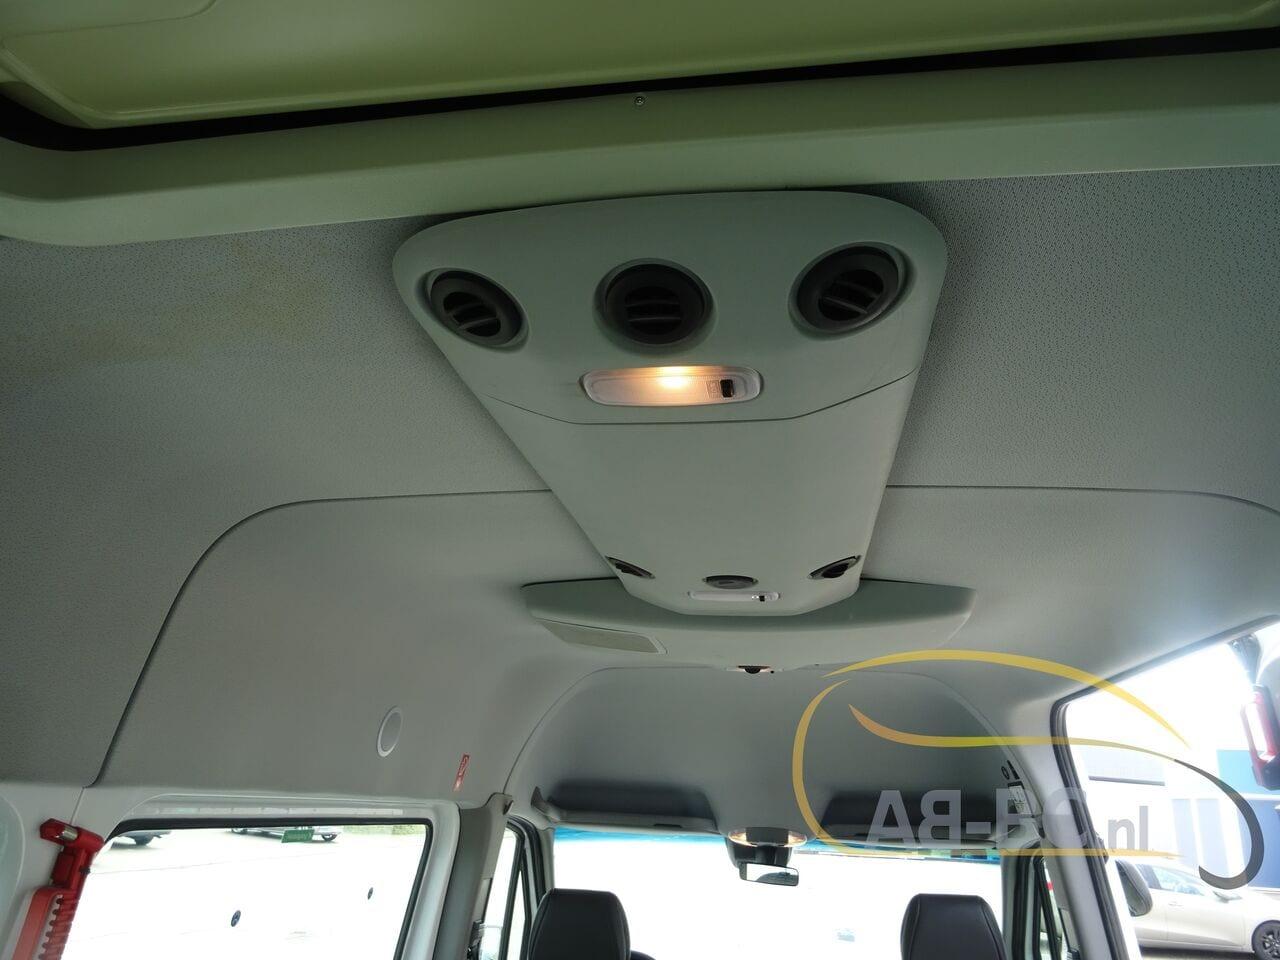 coach-busMERCEDES-BENZ-516-CDI-Sprinter-Transfer-45-23-Seats-EURO-6---1625235104720465563_big_8d9fbf4a00b0cd66e8d806819c791958--21060112394245379500